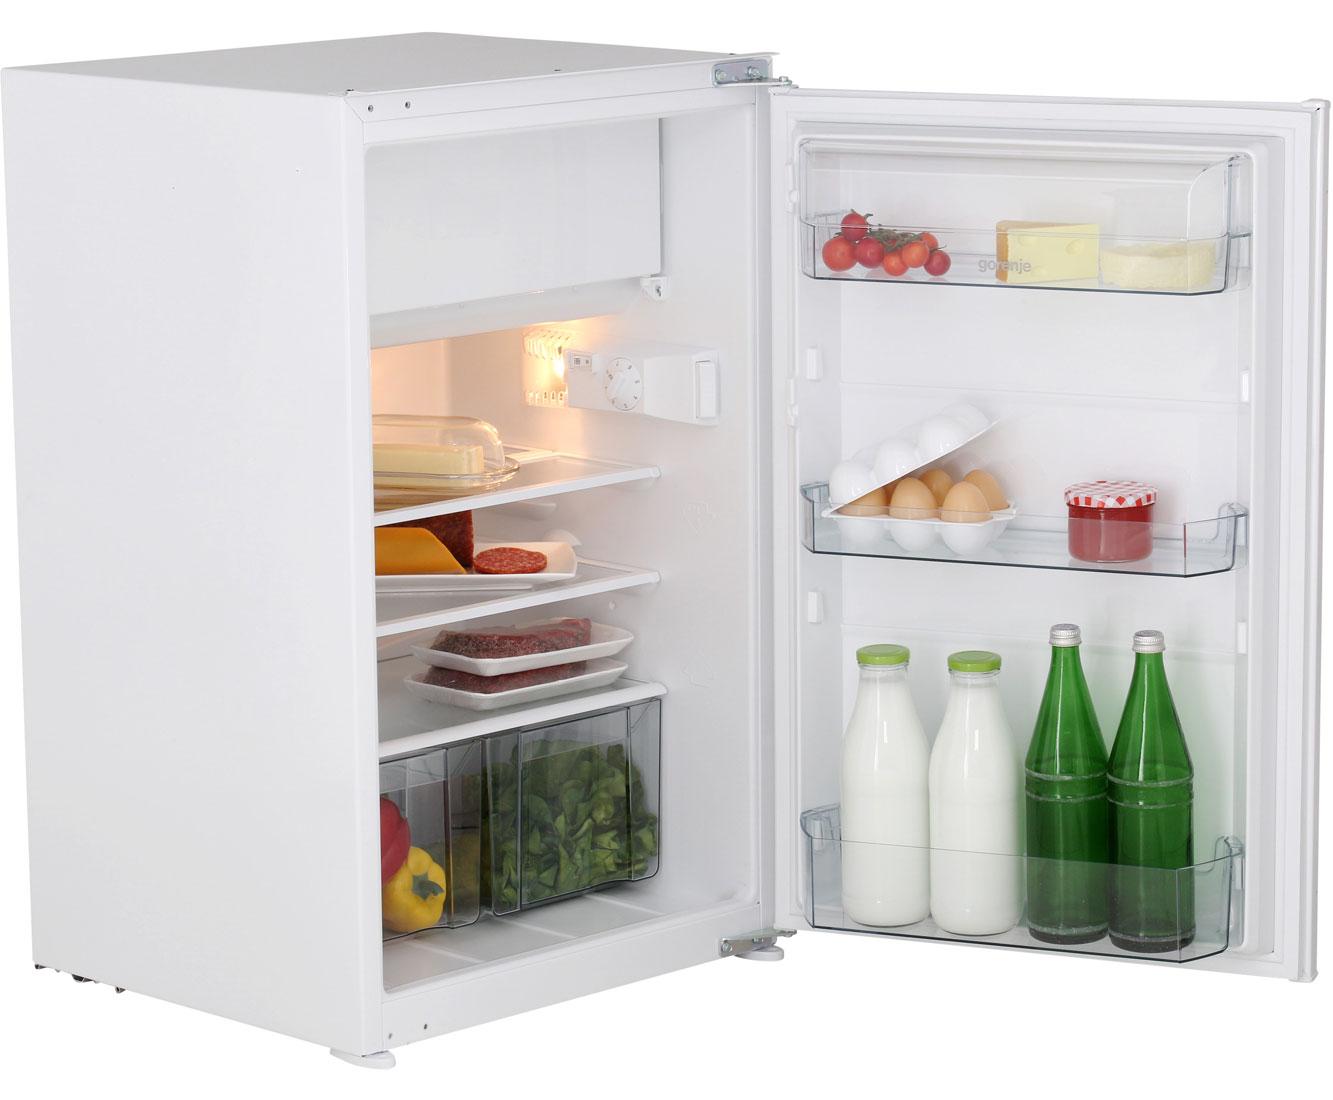 Gorenje RBI 4093 AW Kühlschränke - Weiß